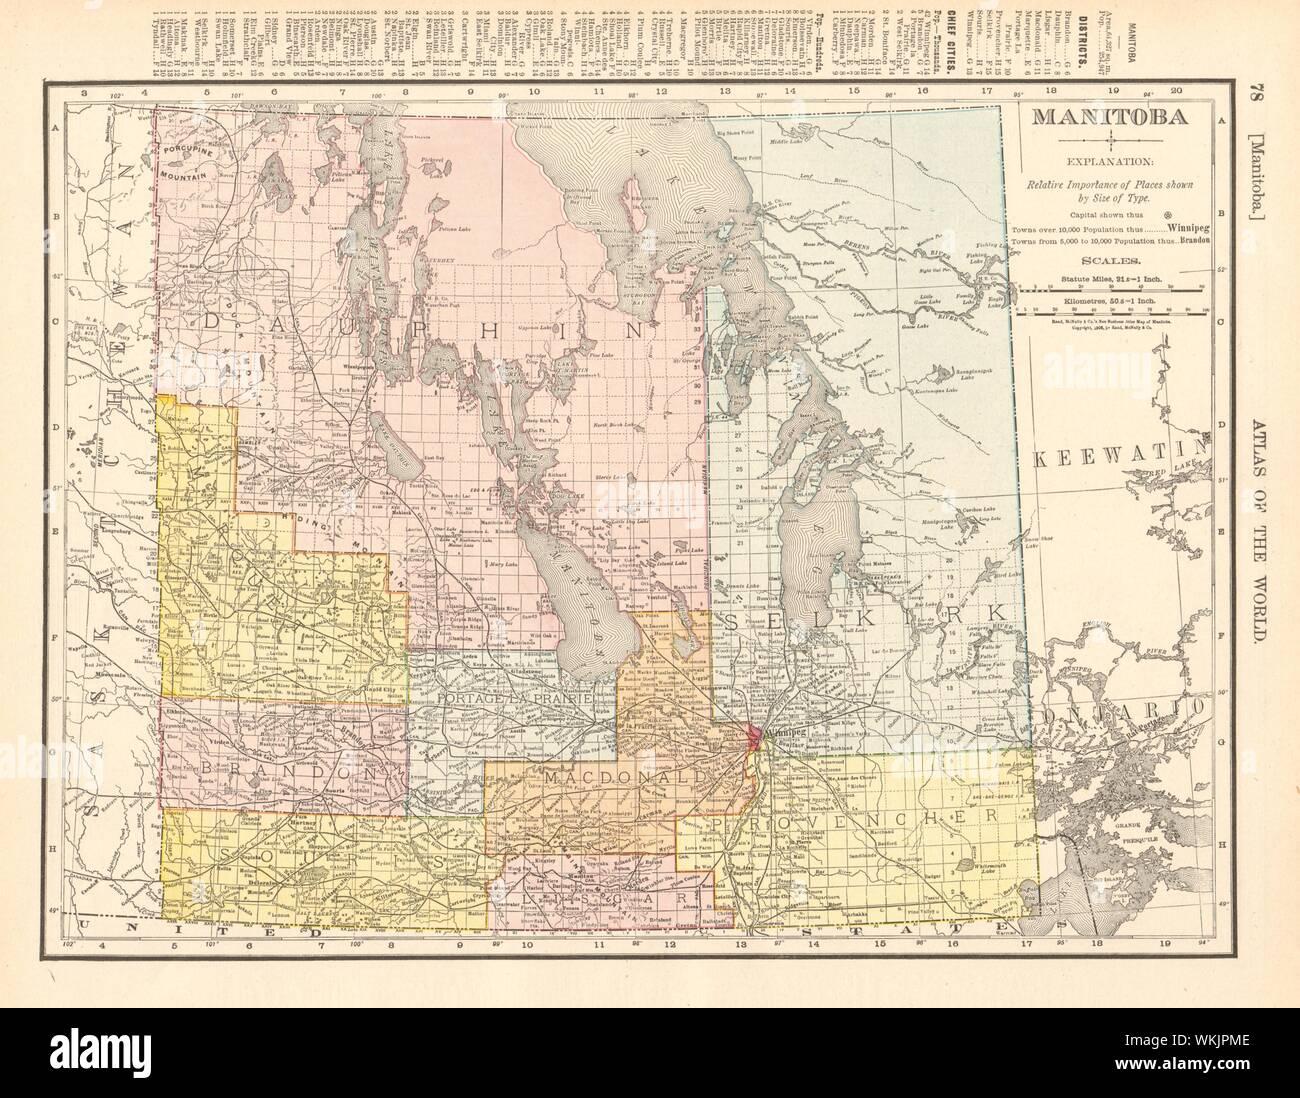 MANITOBA Inset Winnipeg city plan HARMSWORTH 1920 old vintage map chart